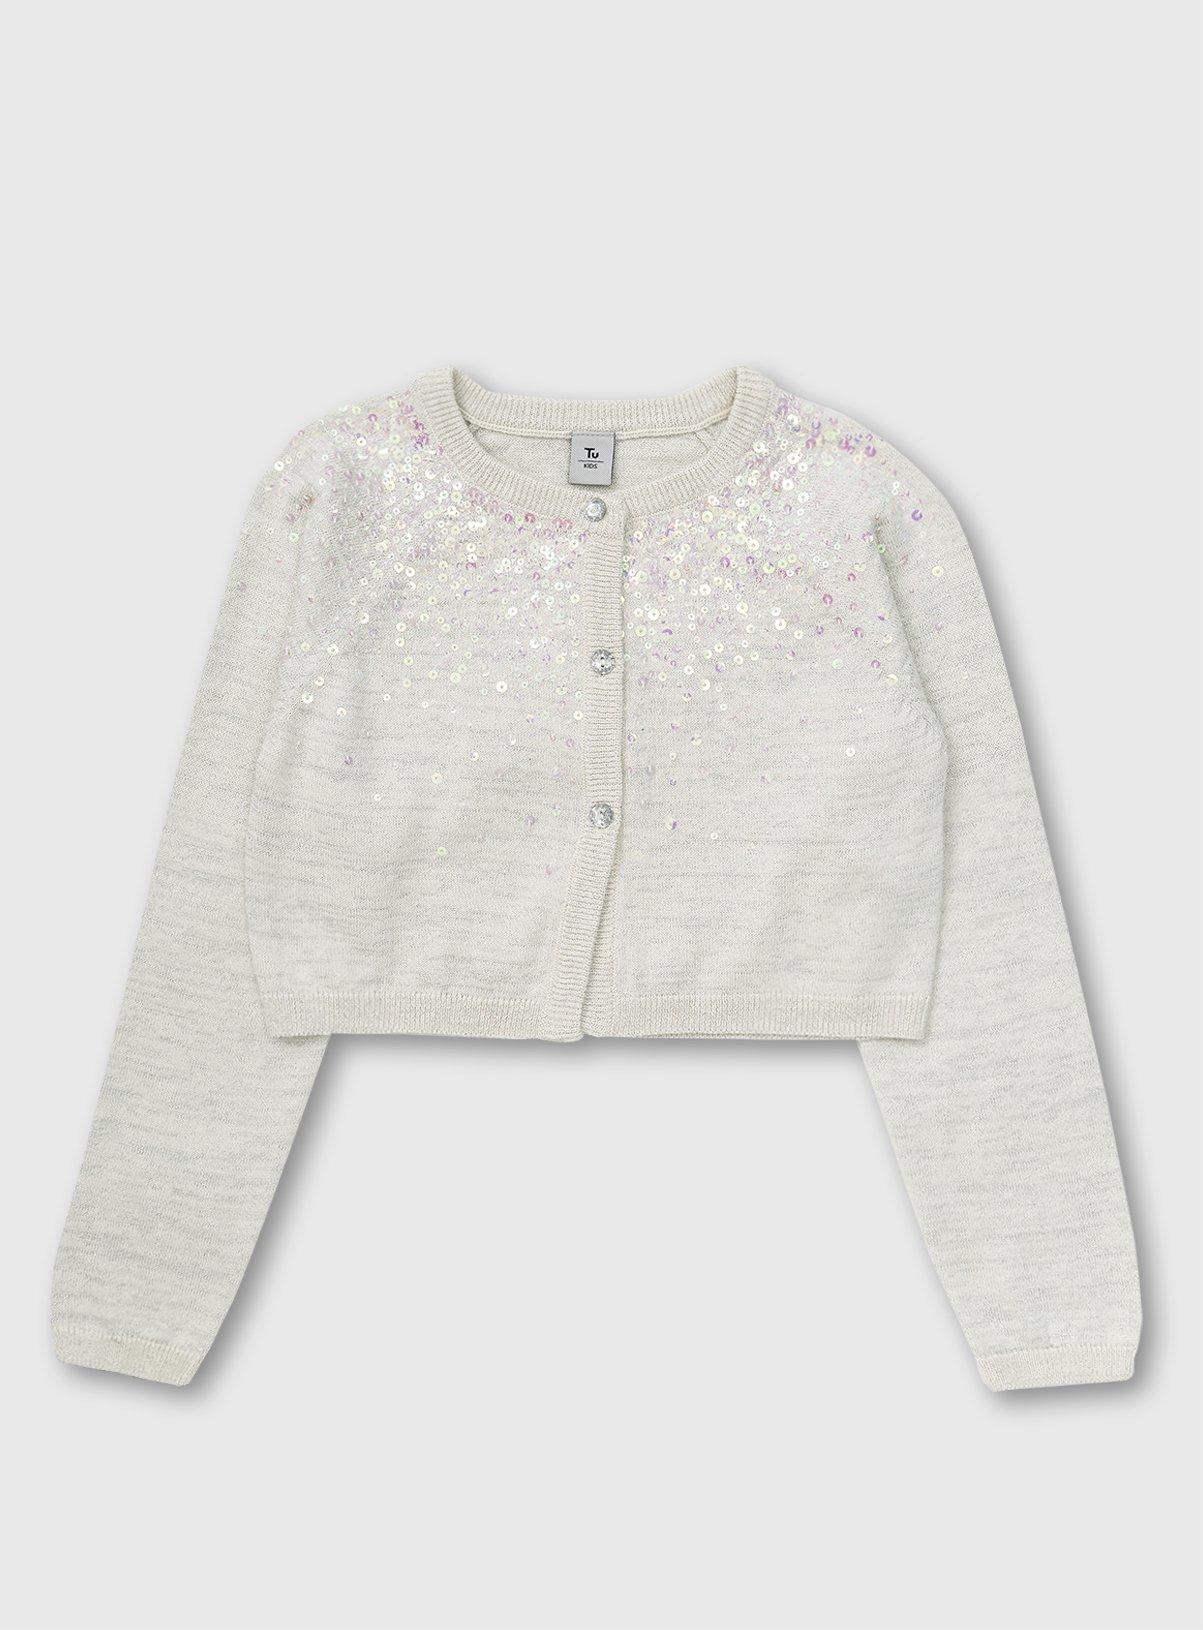 White Glitter Yoke Long Sleeve Bolero - 5 years